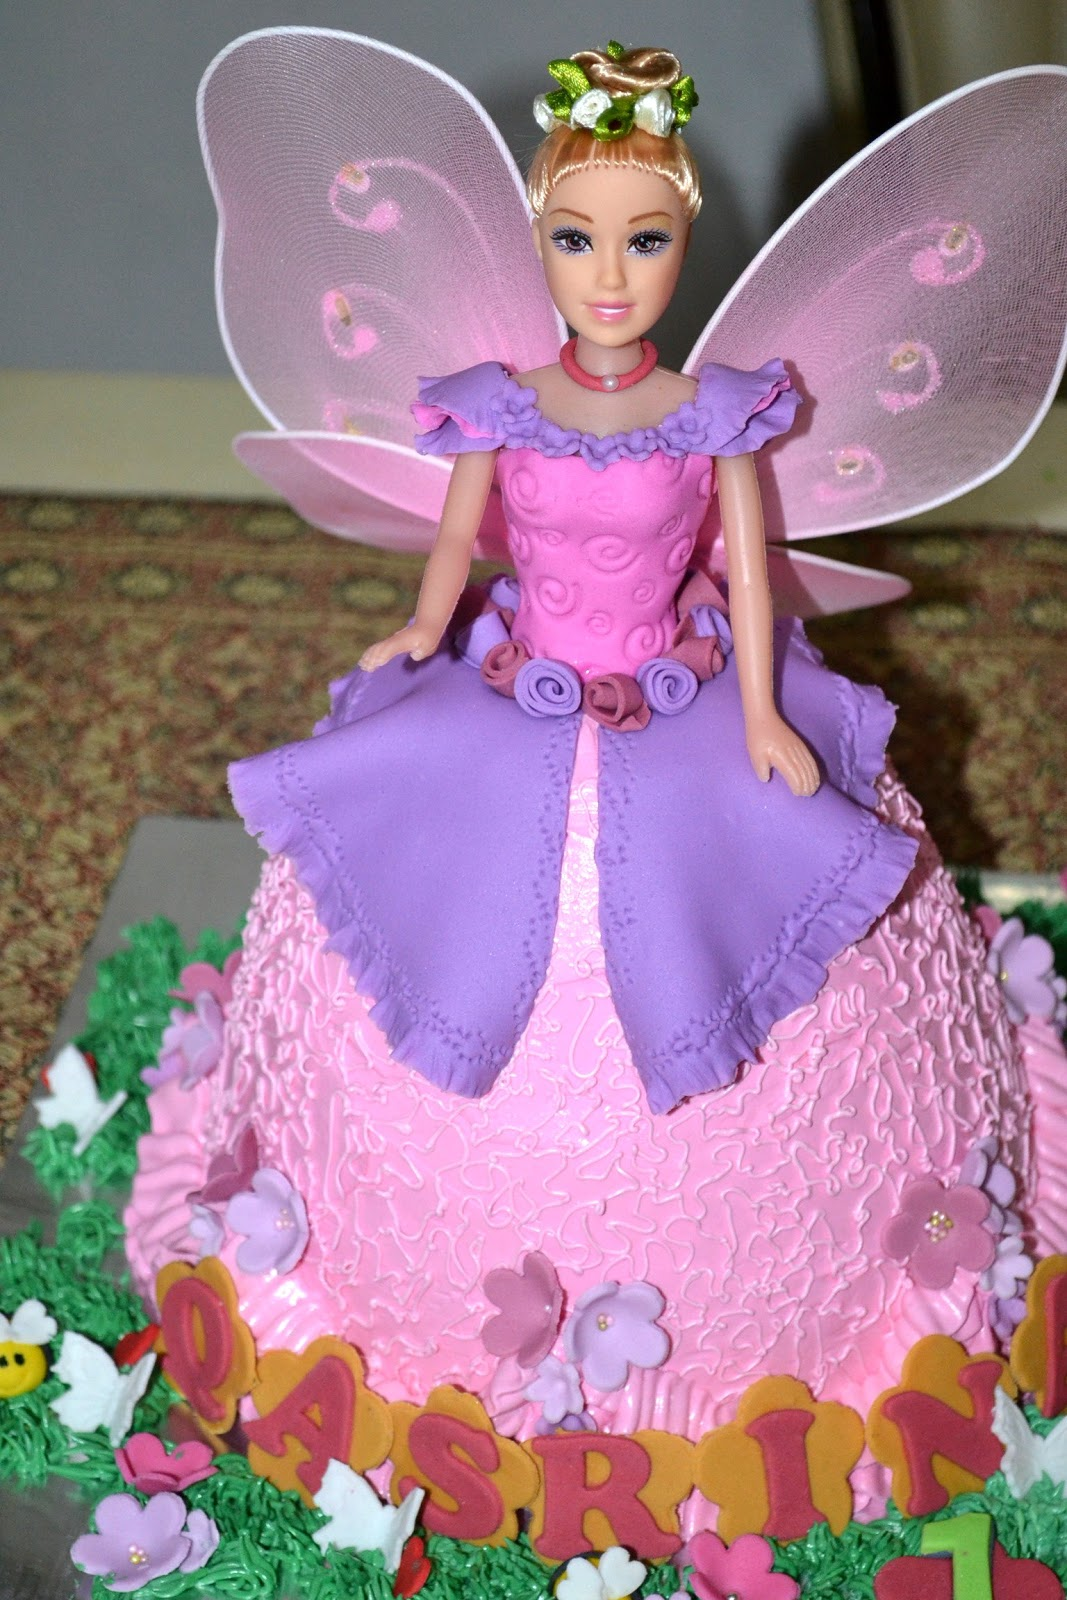 Mypu3 Cake House Princess Doll Cake